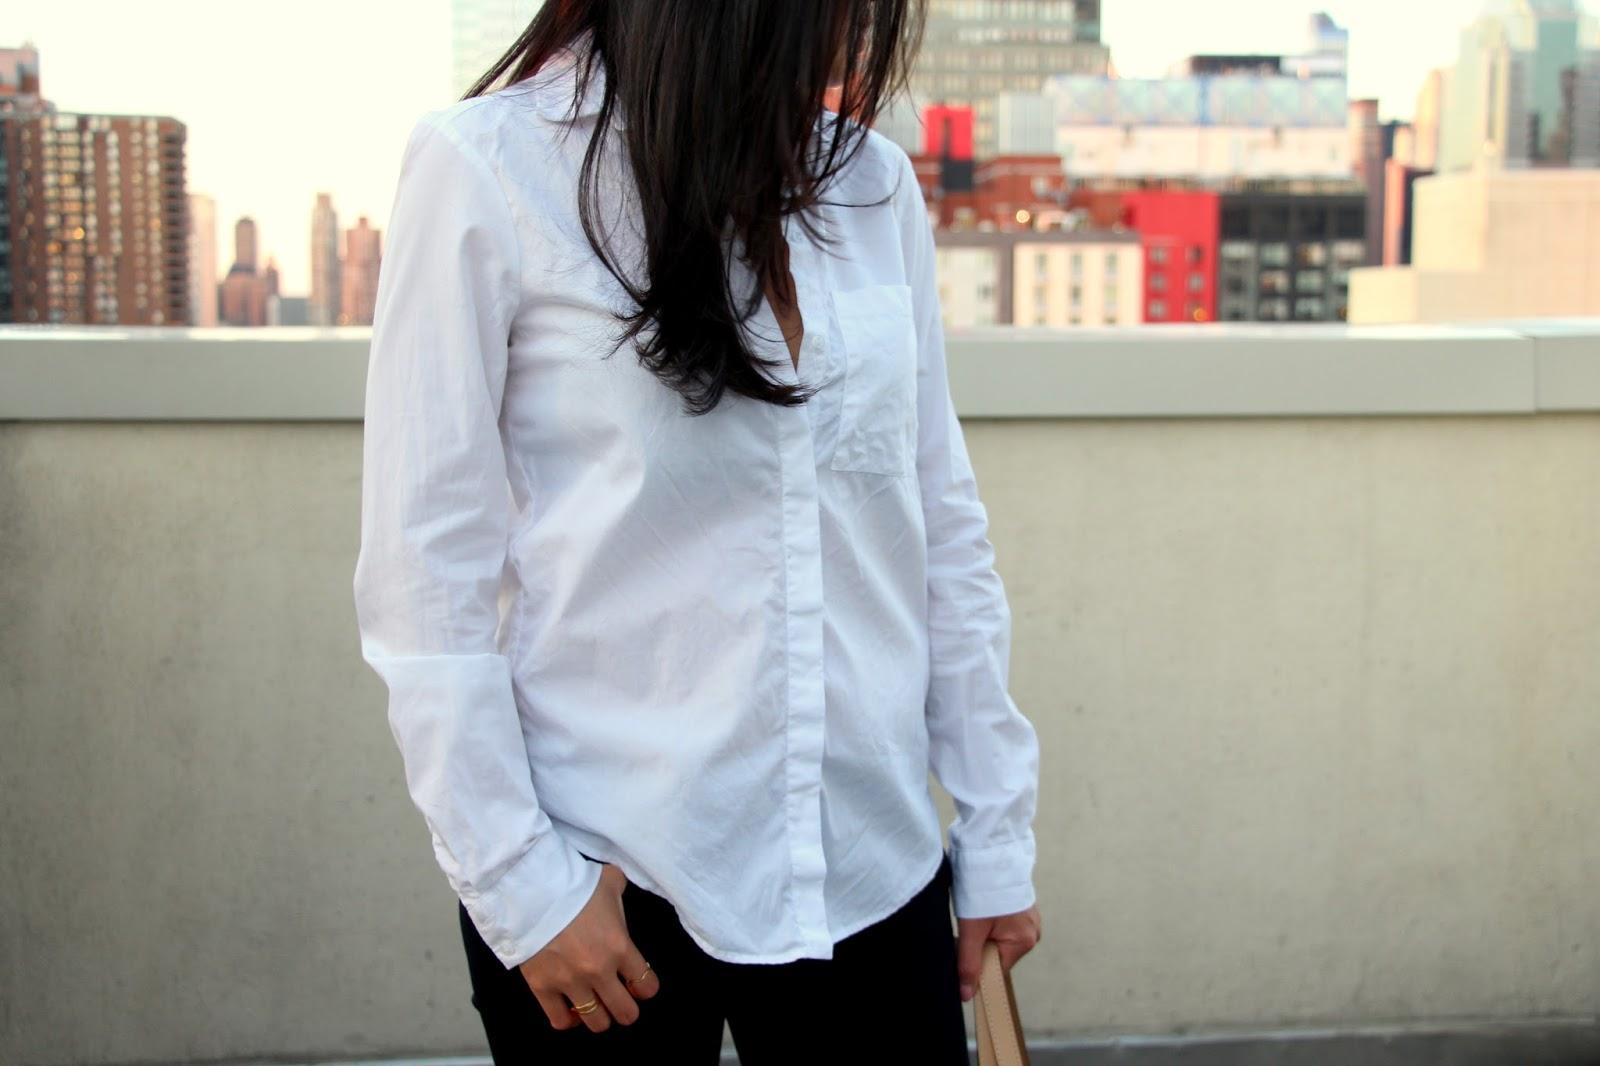 fall flare jeans genetic cypress bell bottom jeans zara white shirt tibi mules rebecca minkoff dylan mini tote